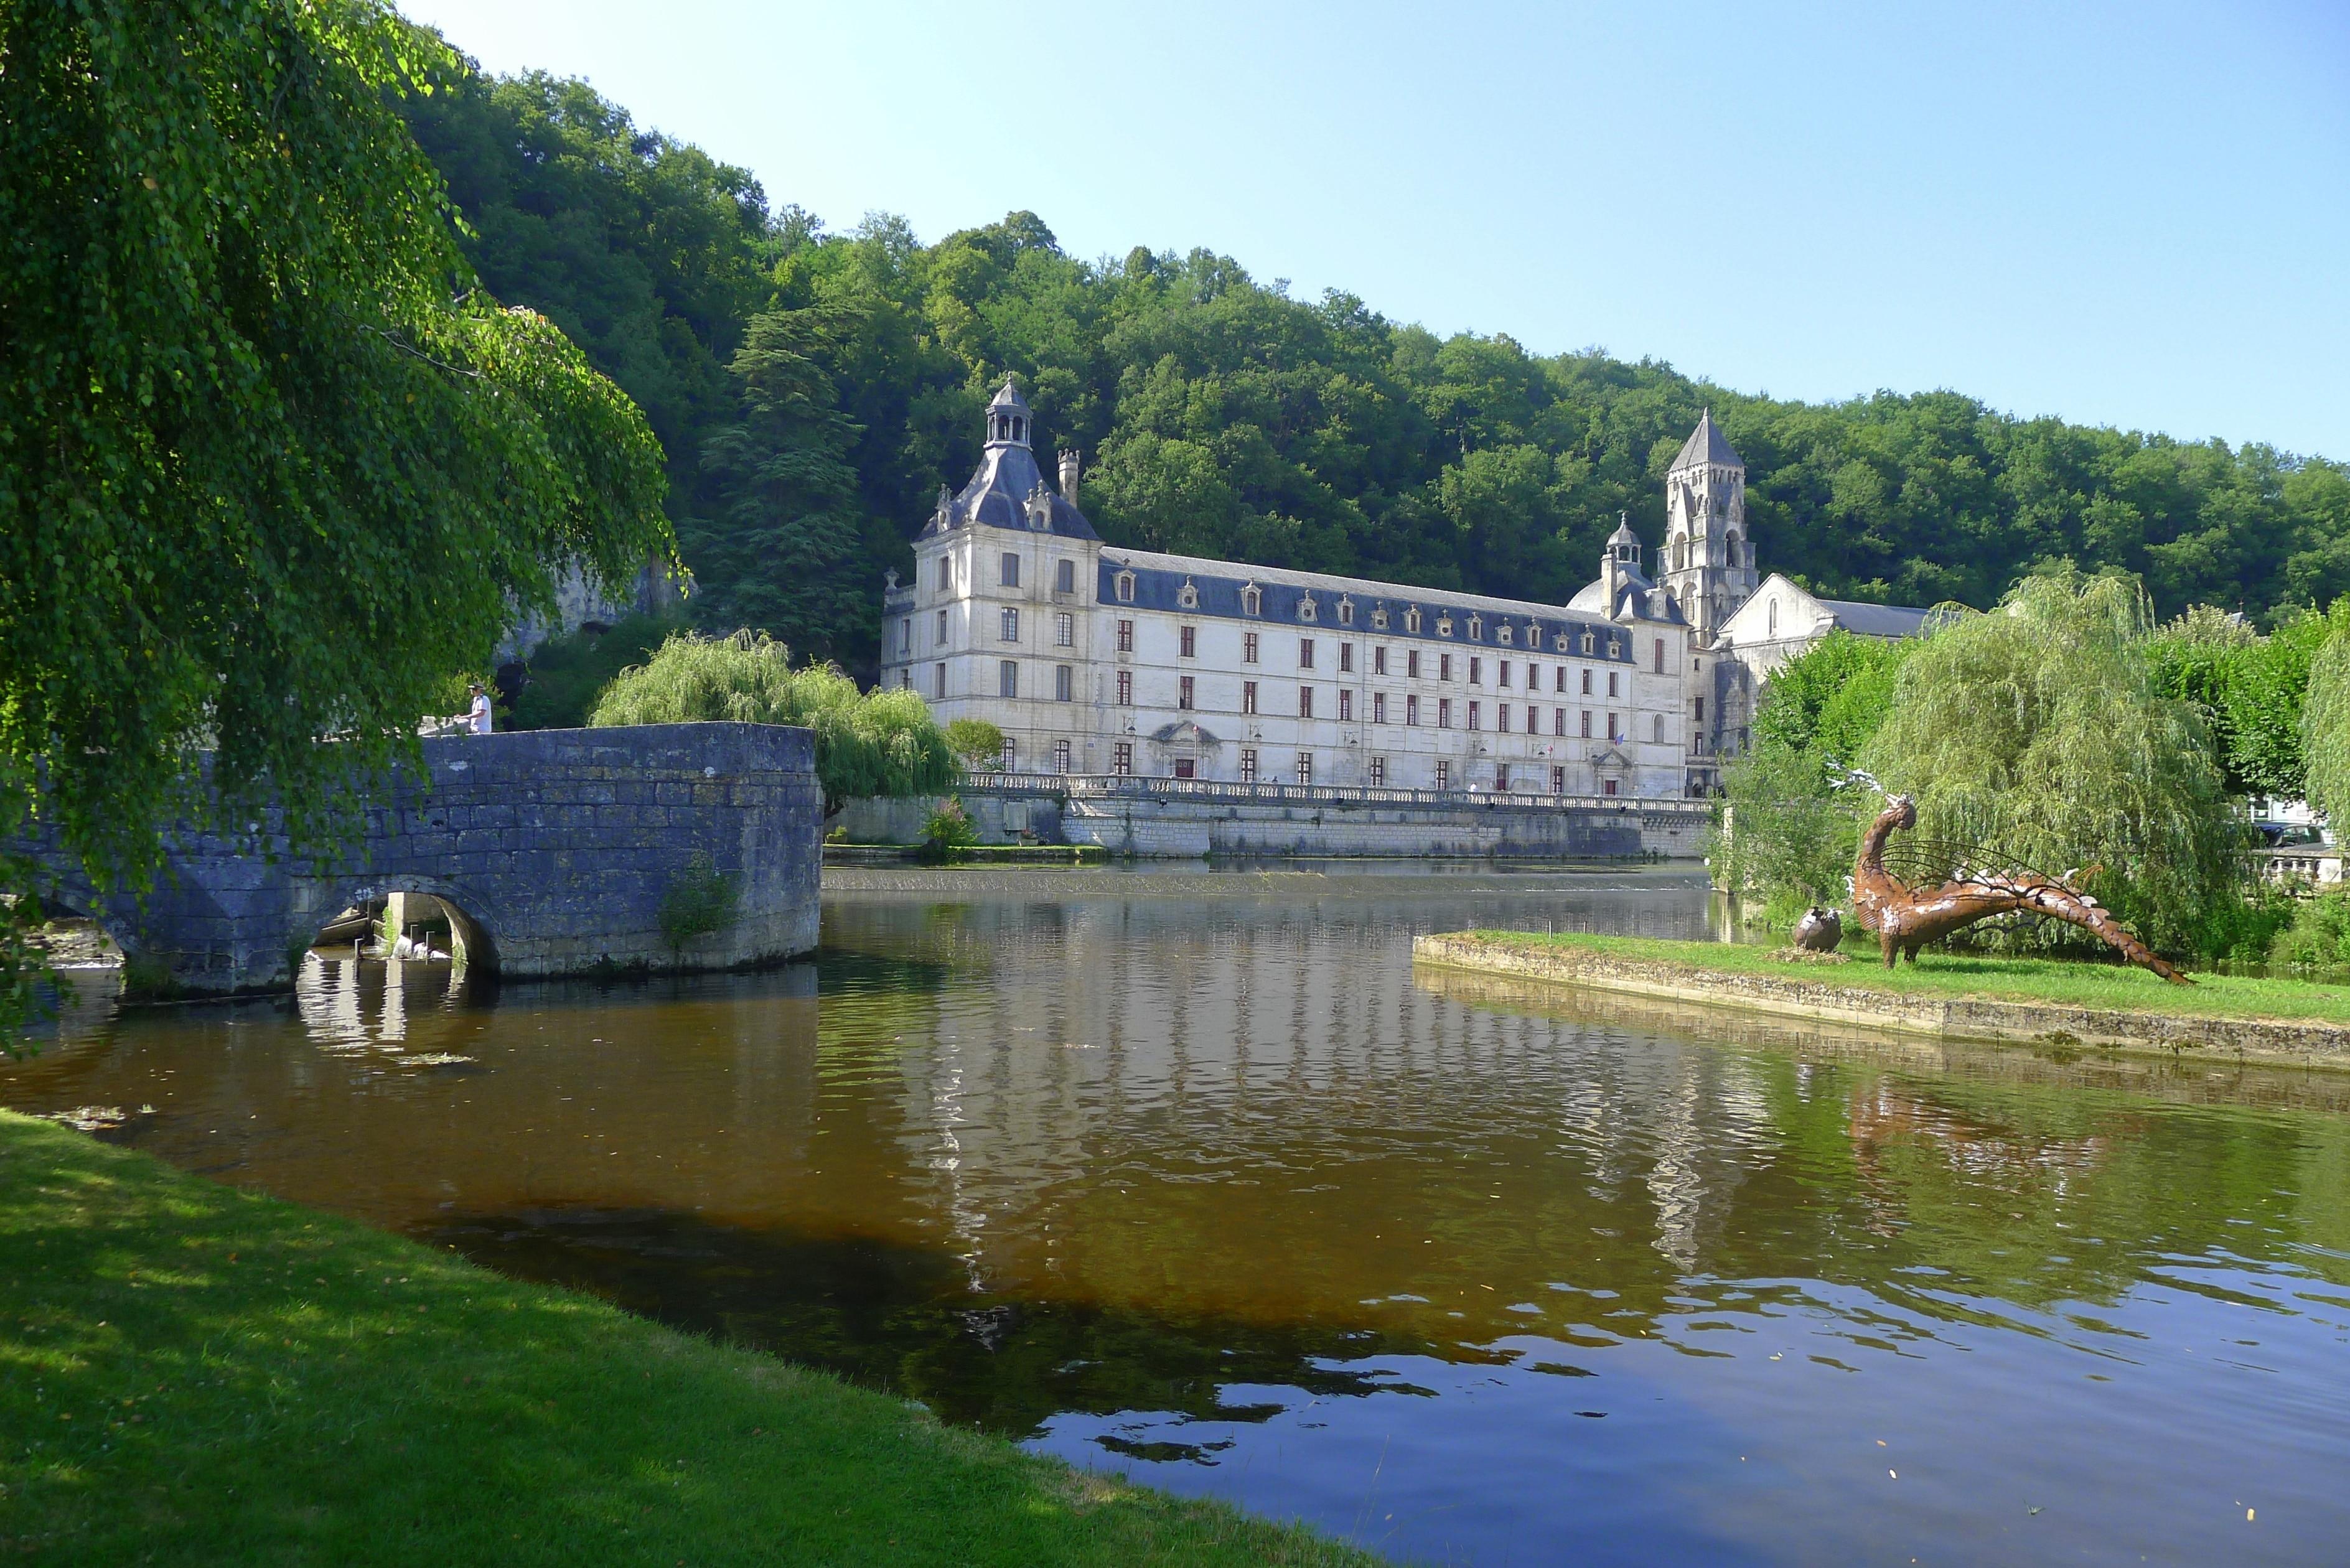 Brantome Abbey, Brantôme en Périgord, Dordogne, France